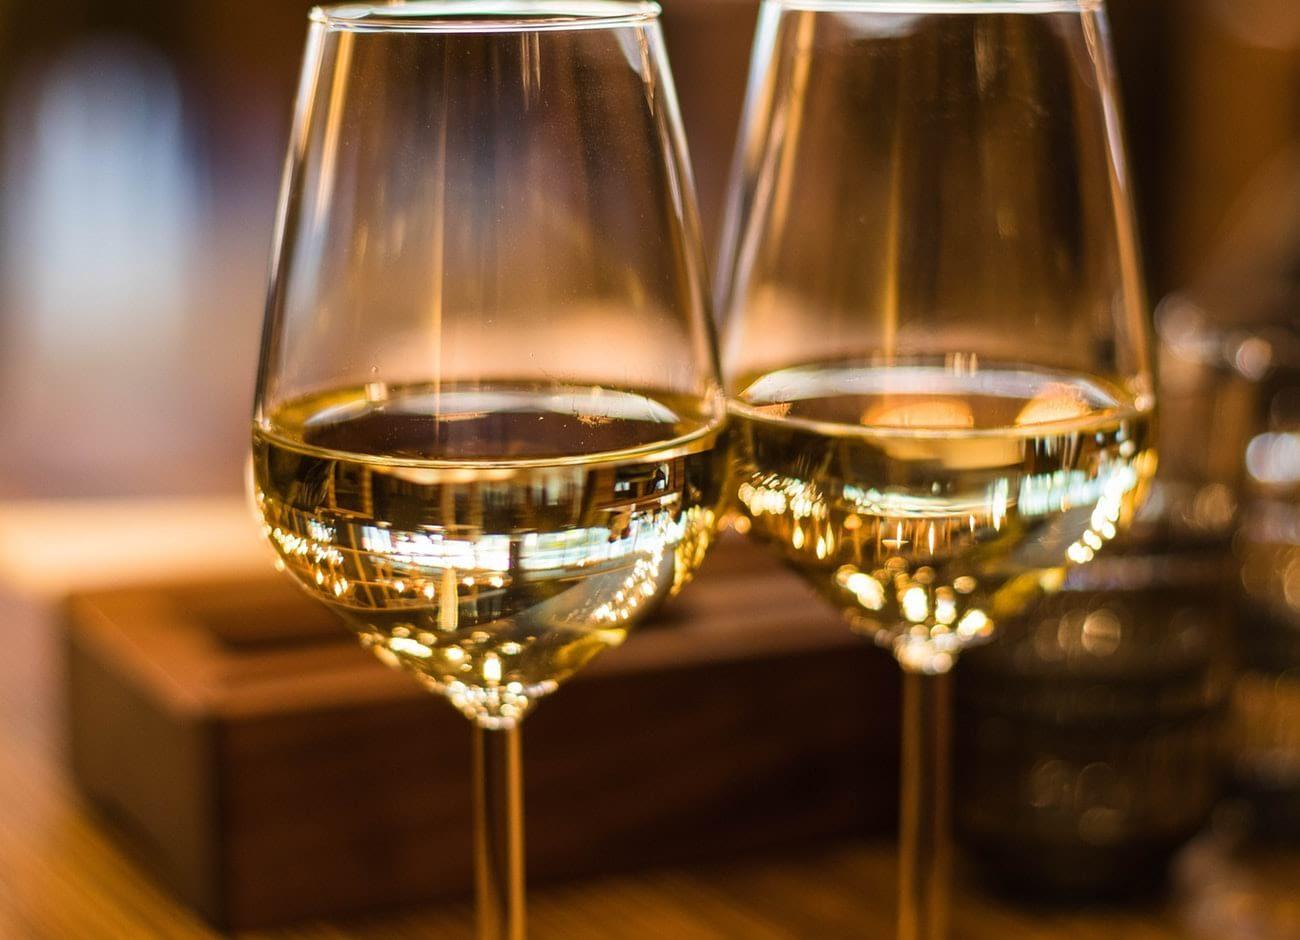 Detroit Vineyards glass of wine